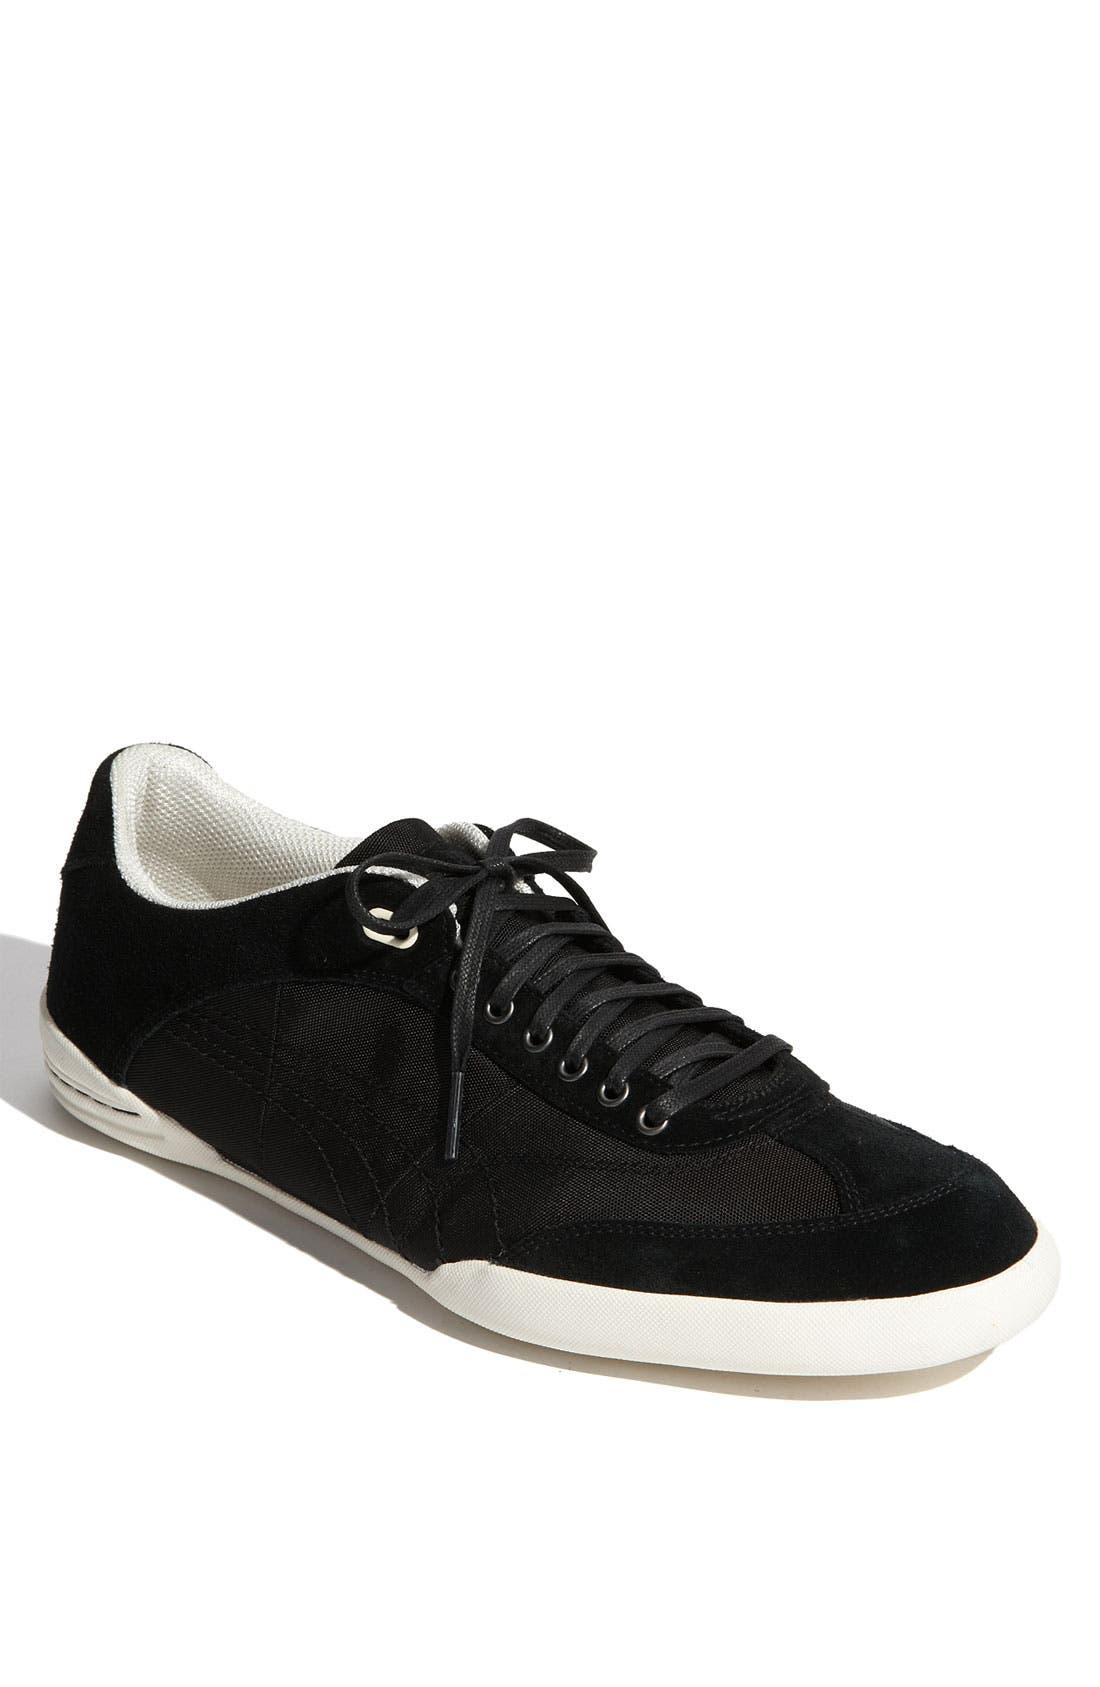 'Blackstation Standpunkt' Sneaker,                             Main thumbnail 1, color,                             001